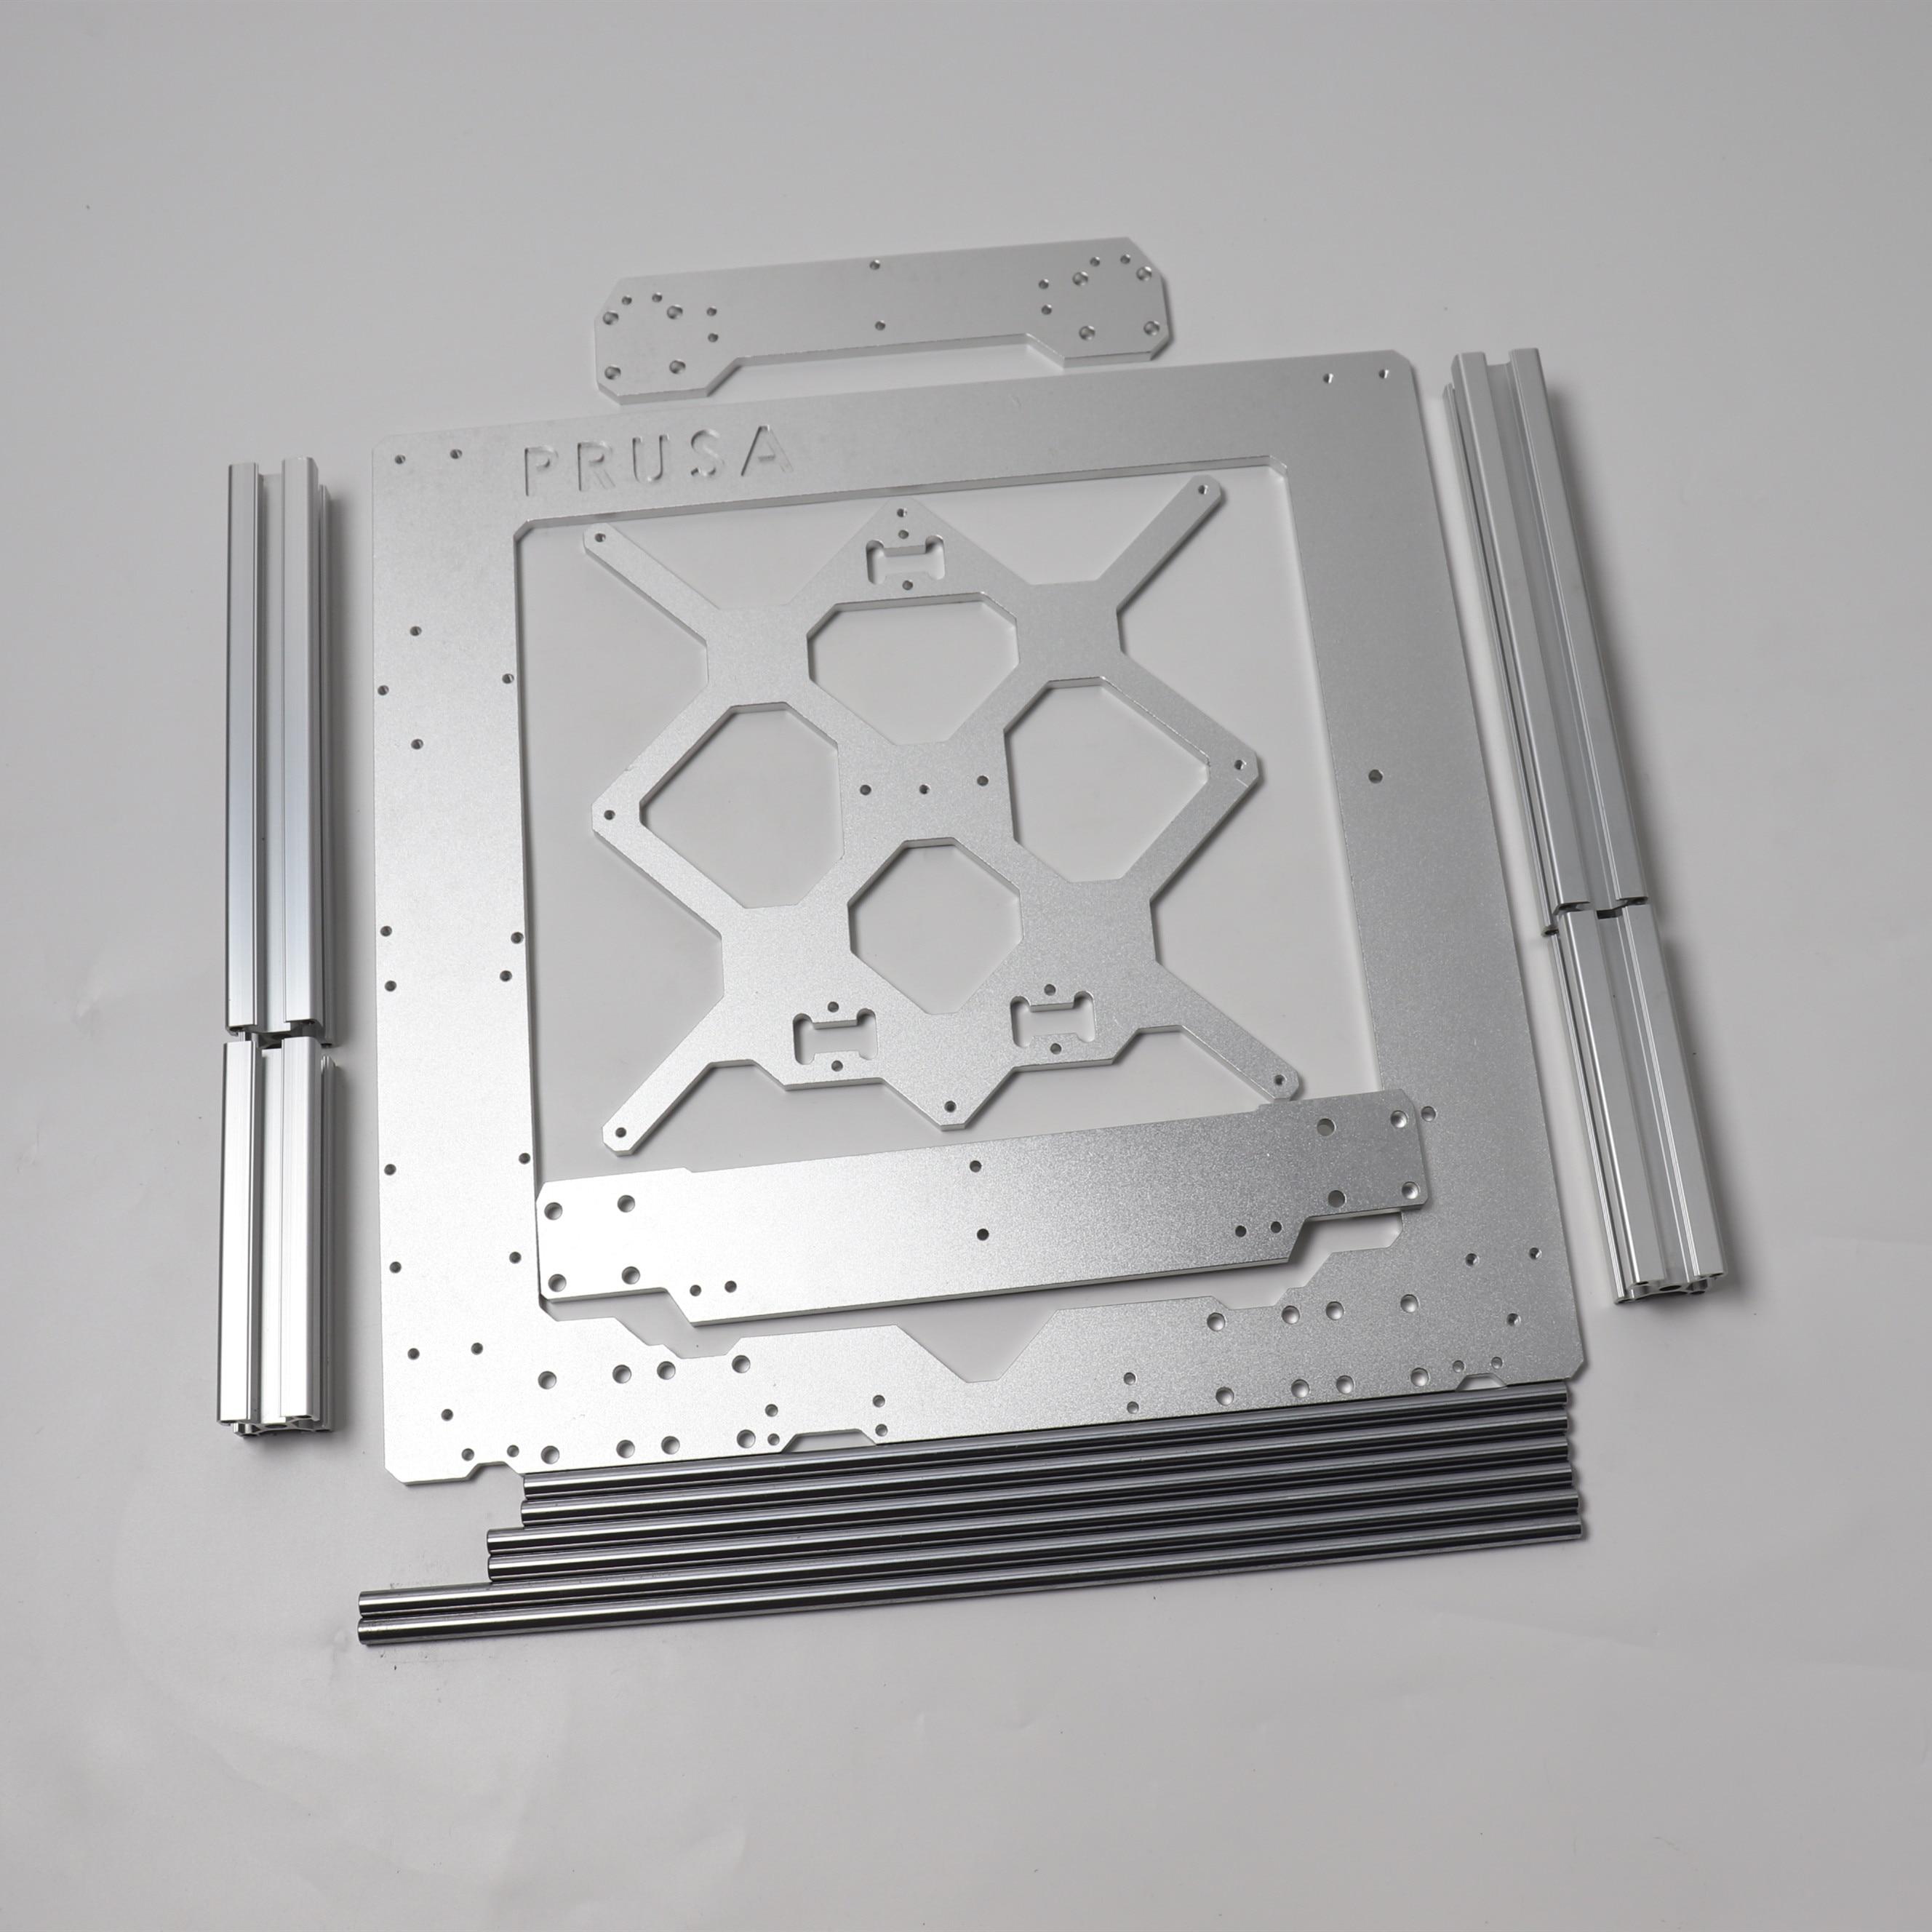 Prusa i3 MK3/MK3S impresora 3d marco de aluminio 3030 perfiles y 8mm OD kit de varillas lisas